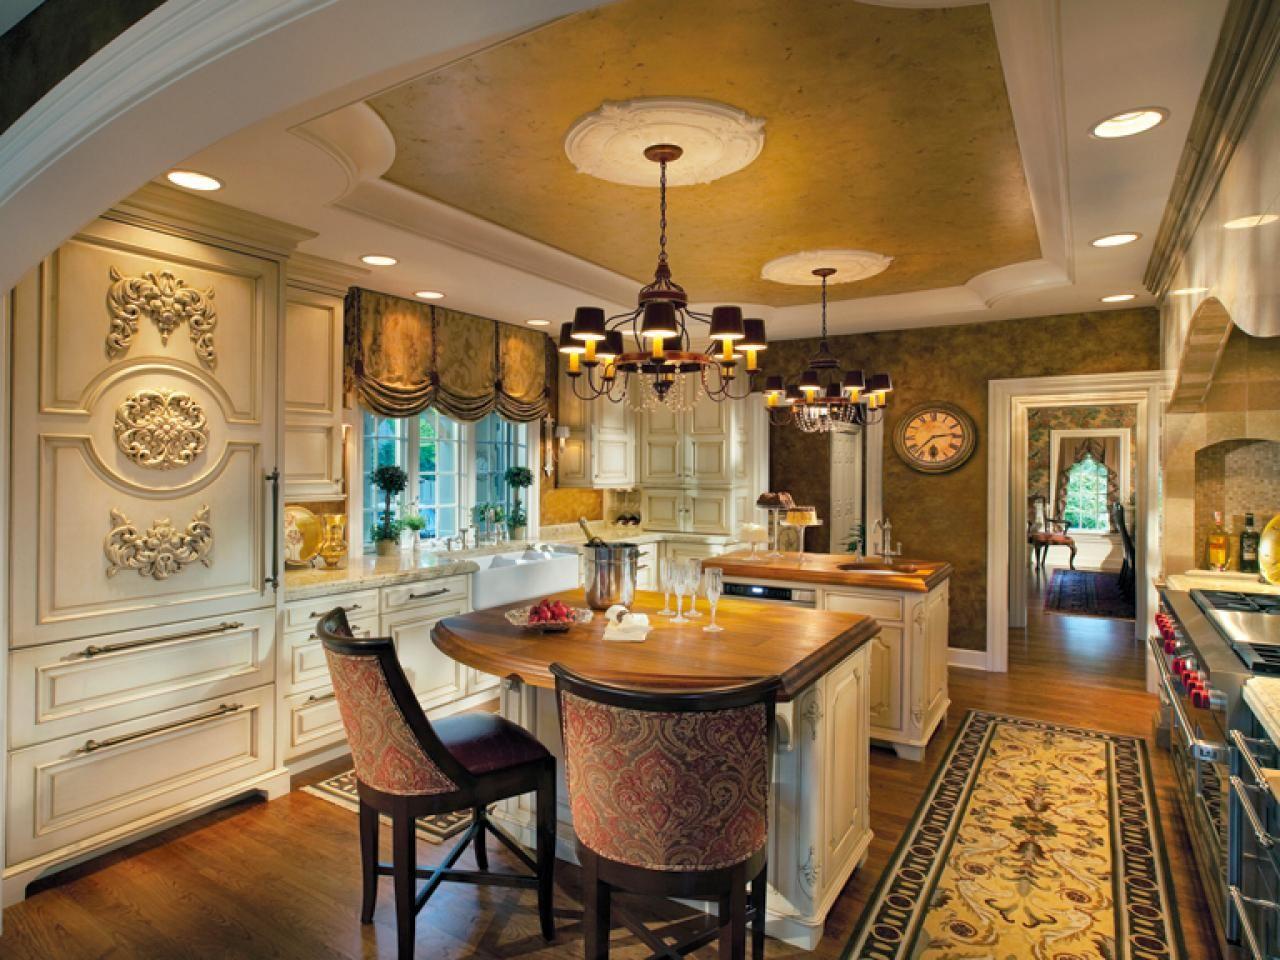 Fullsize Of Kitchen Layout Options